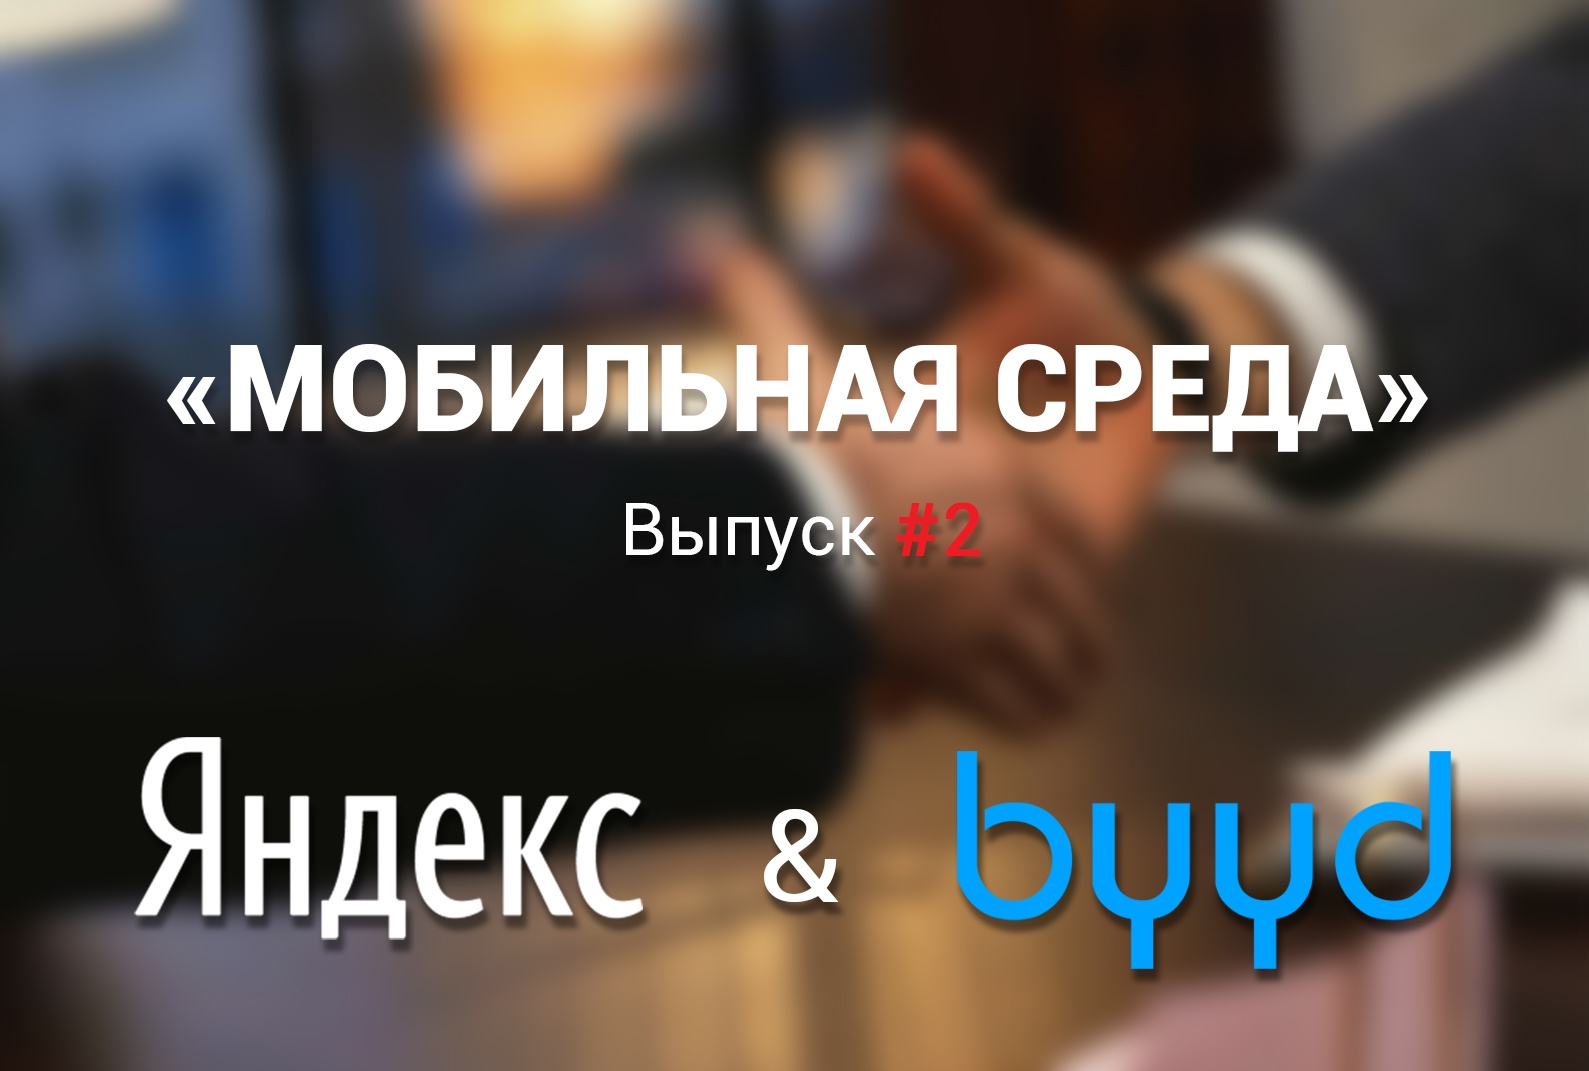 Мобильная Среда, Выпуск #02: Яндекс, специально для канала BYYD, мобильная реклама - 1